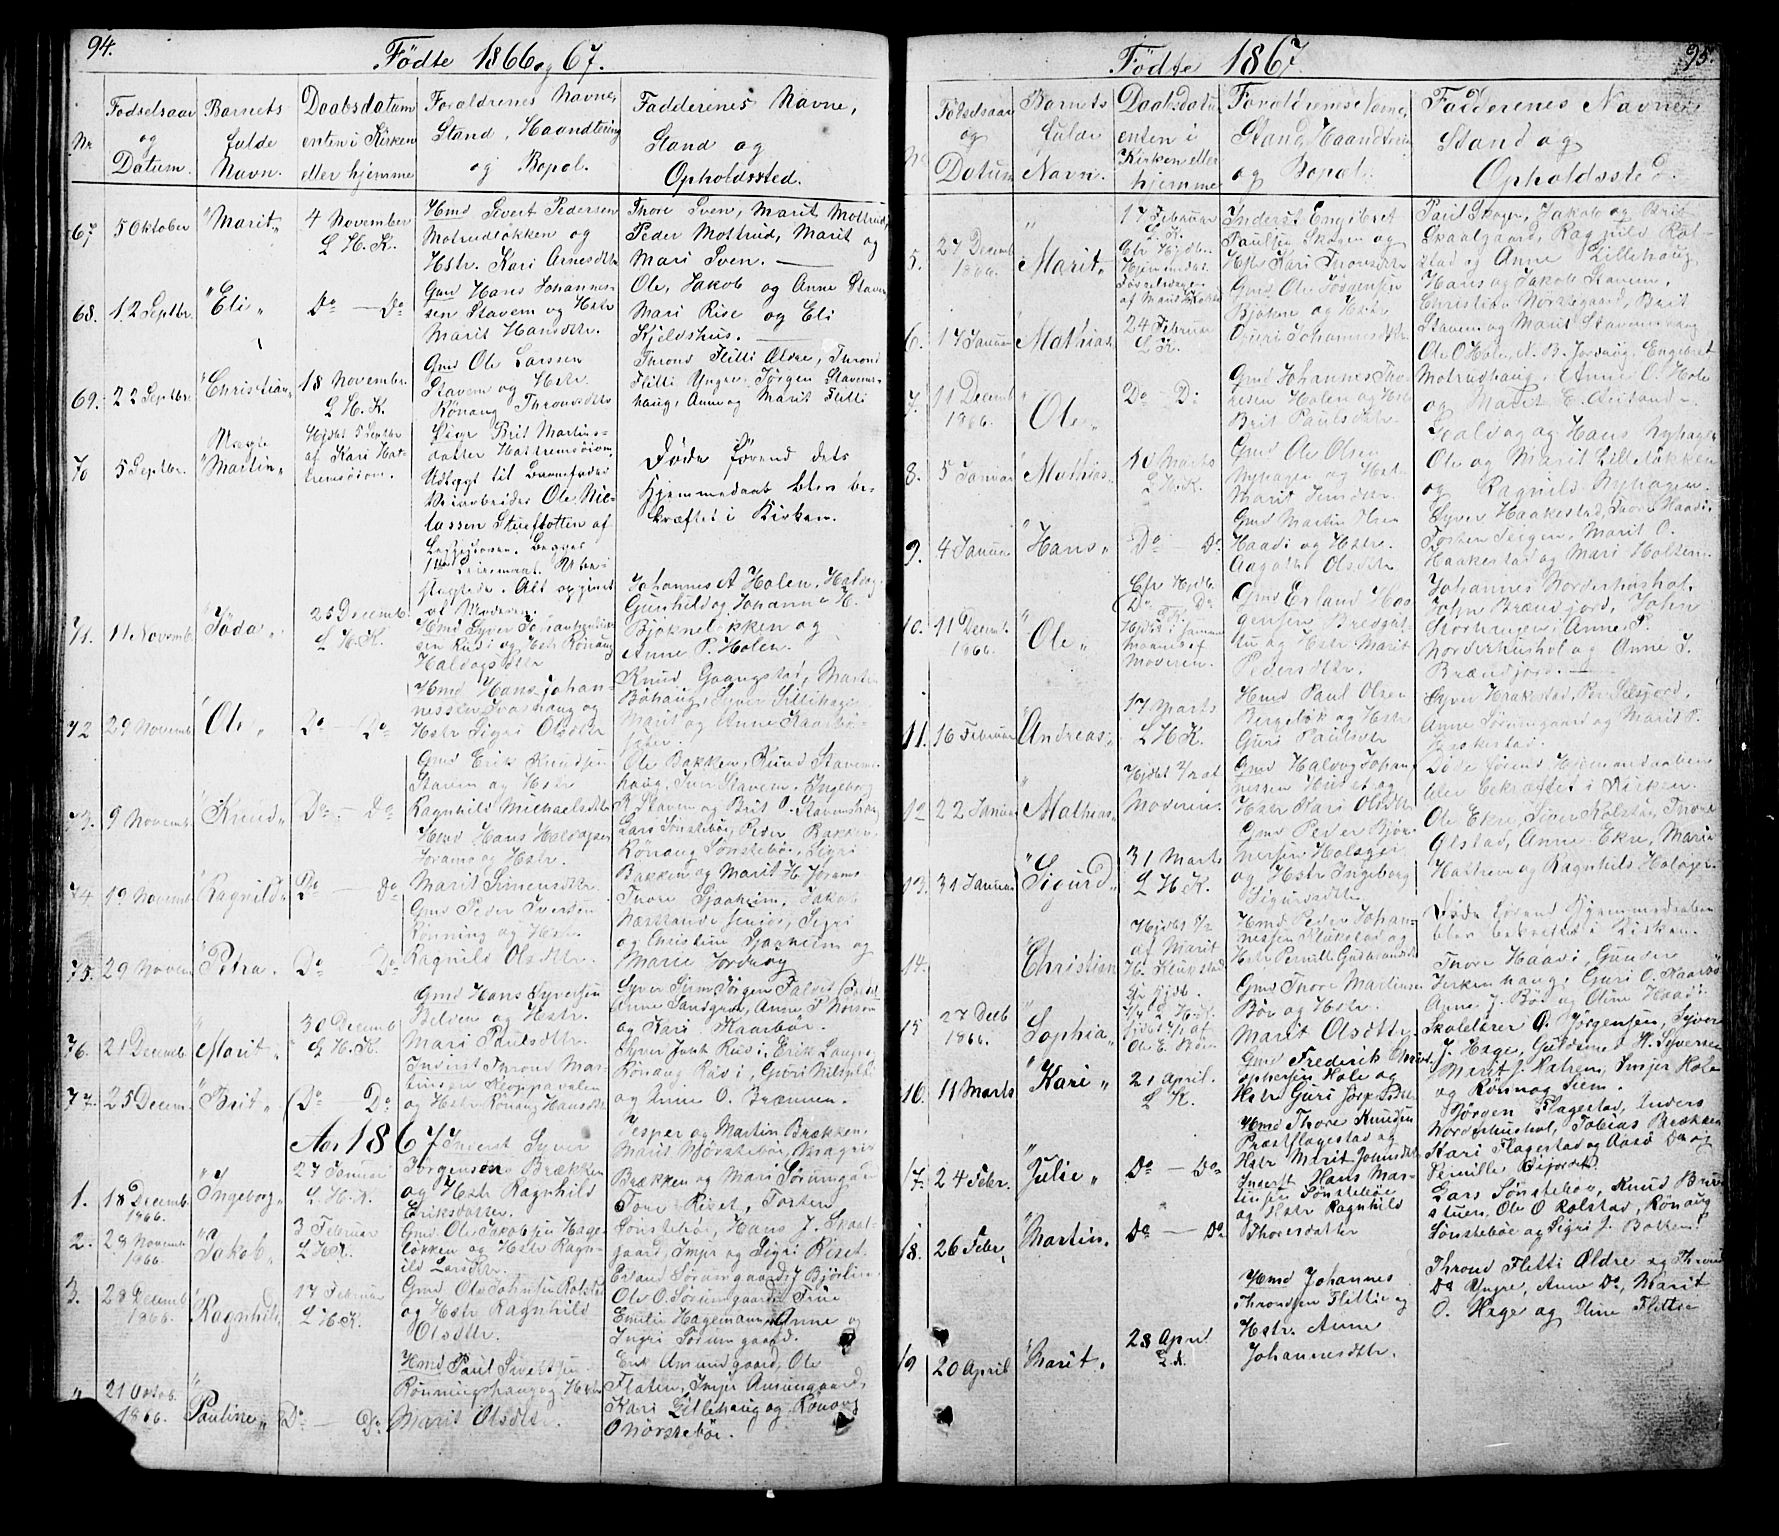 SAH, Lesja prestekontor, Klokkerbok nr. 5, 1850-1894, s. 94-95